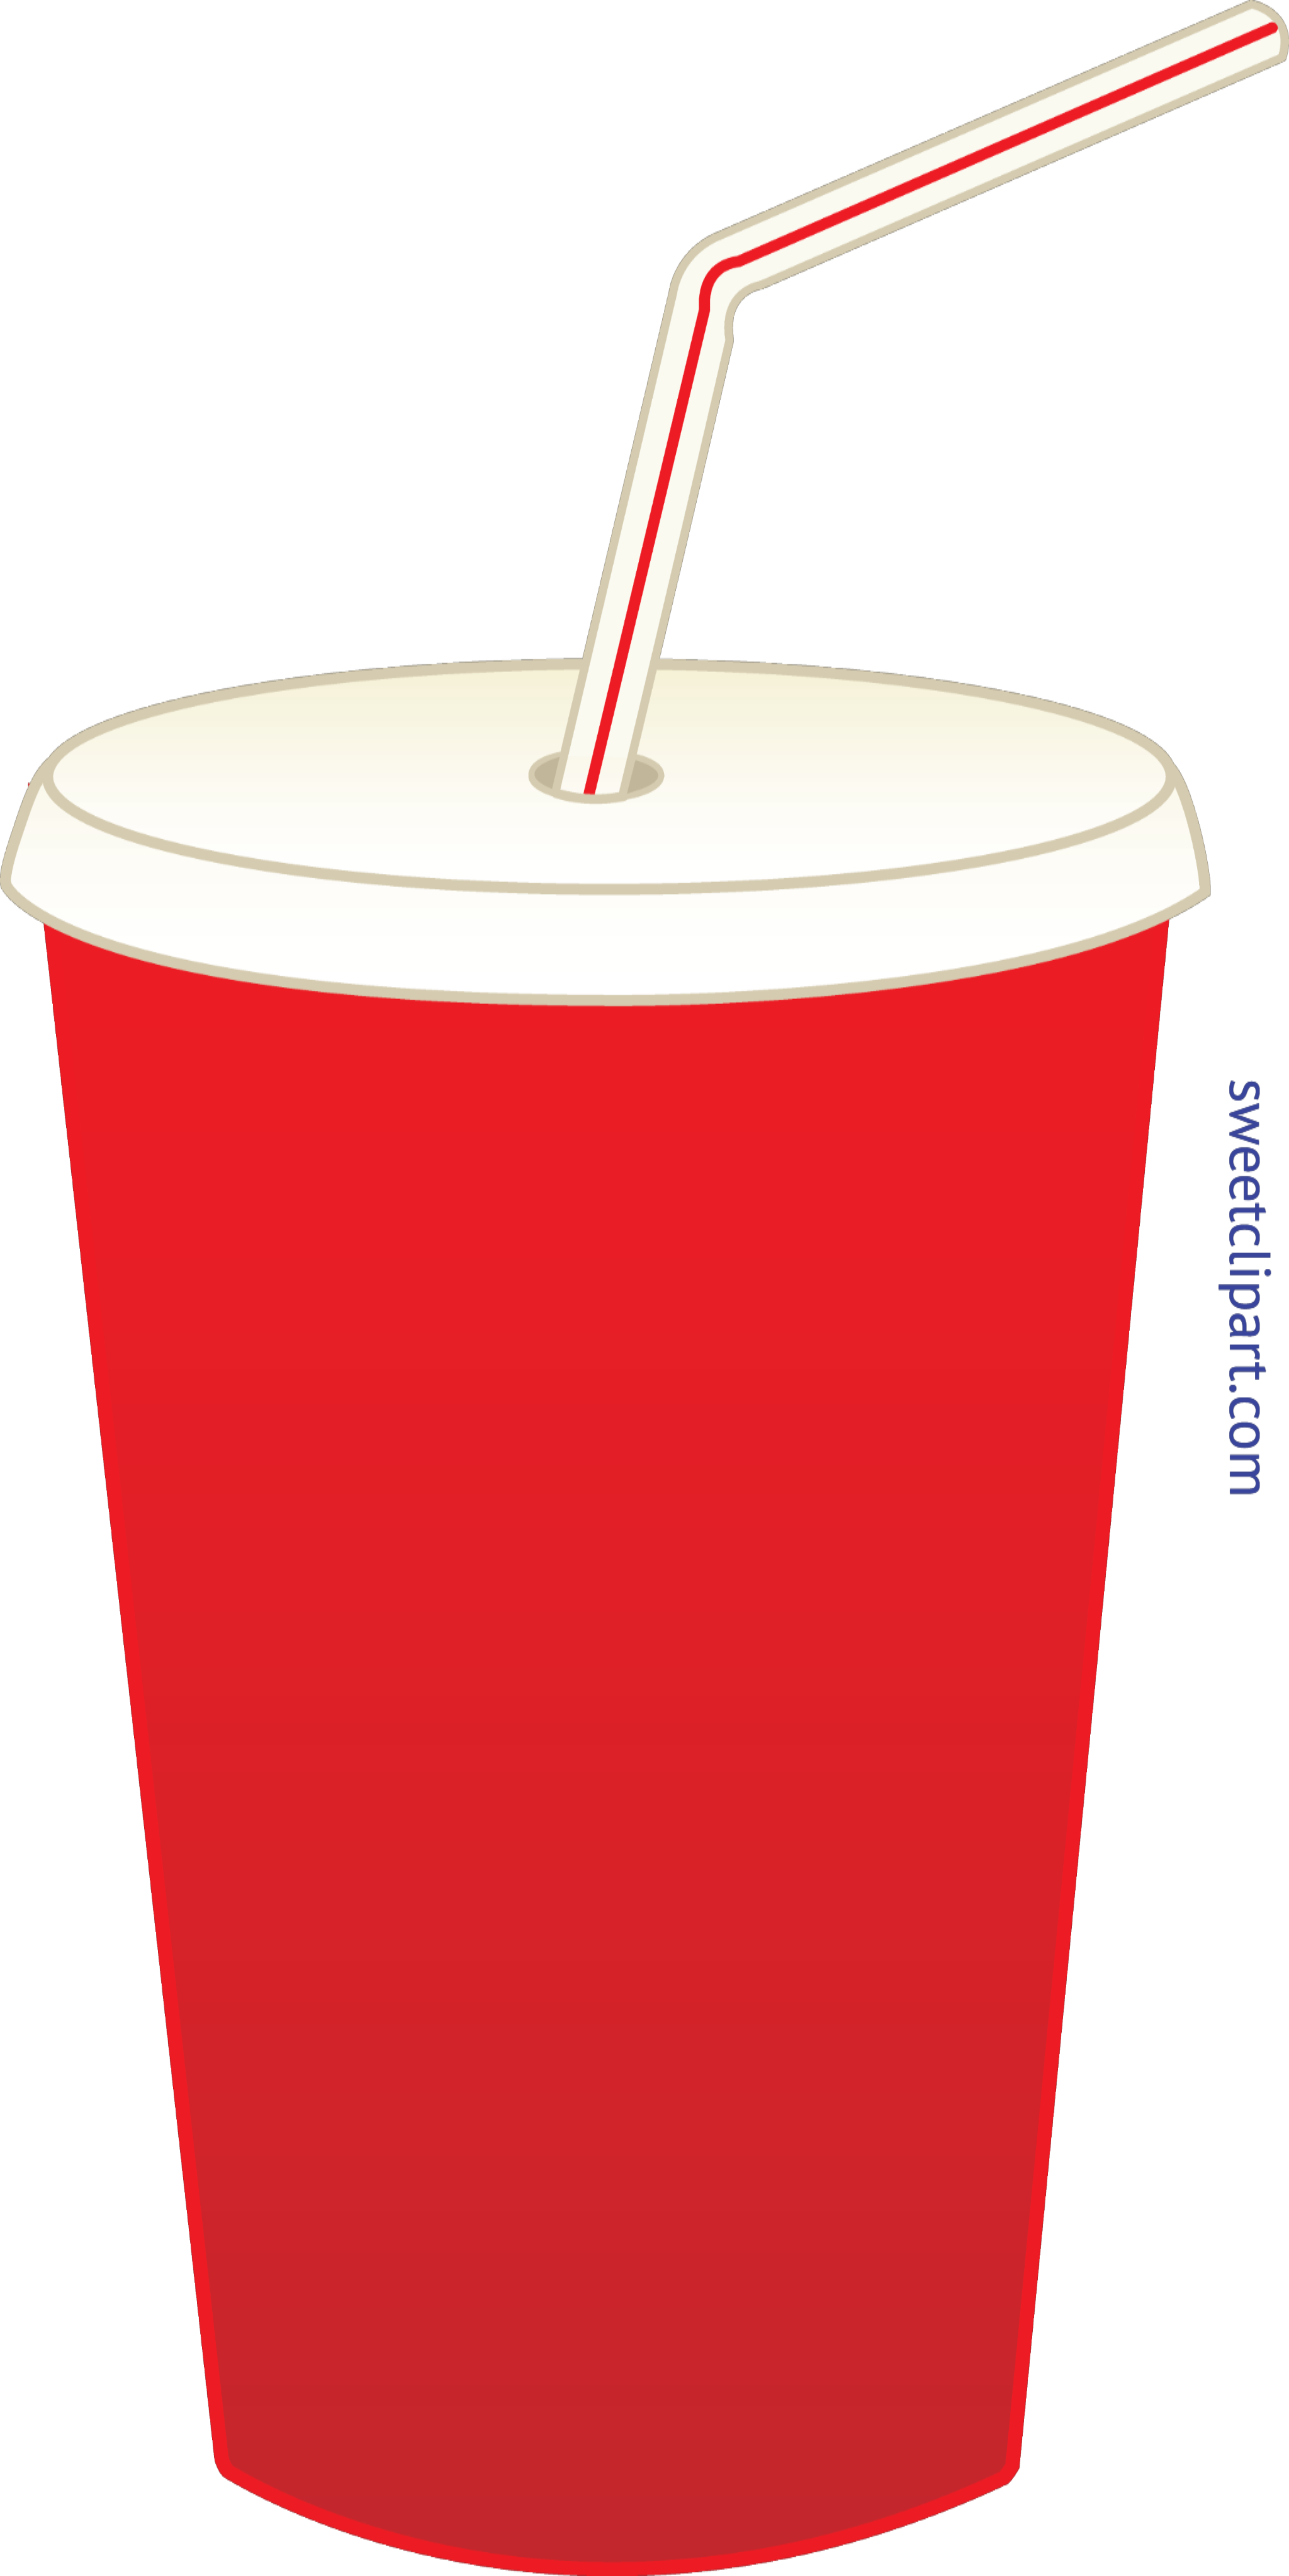 Soda Pop In Cup Clip Art.